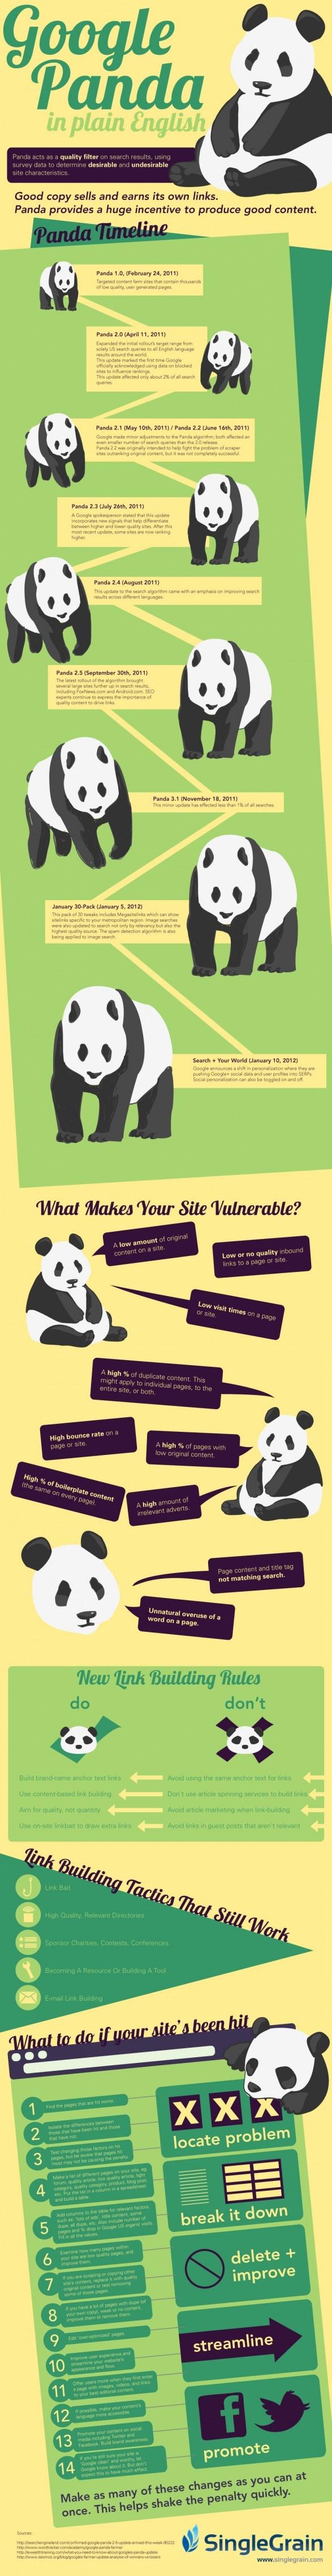 Google Panda in Plain English